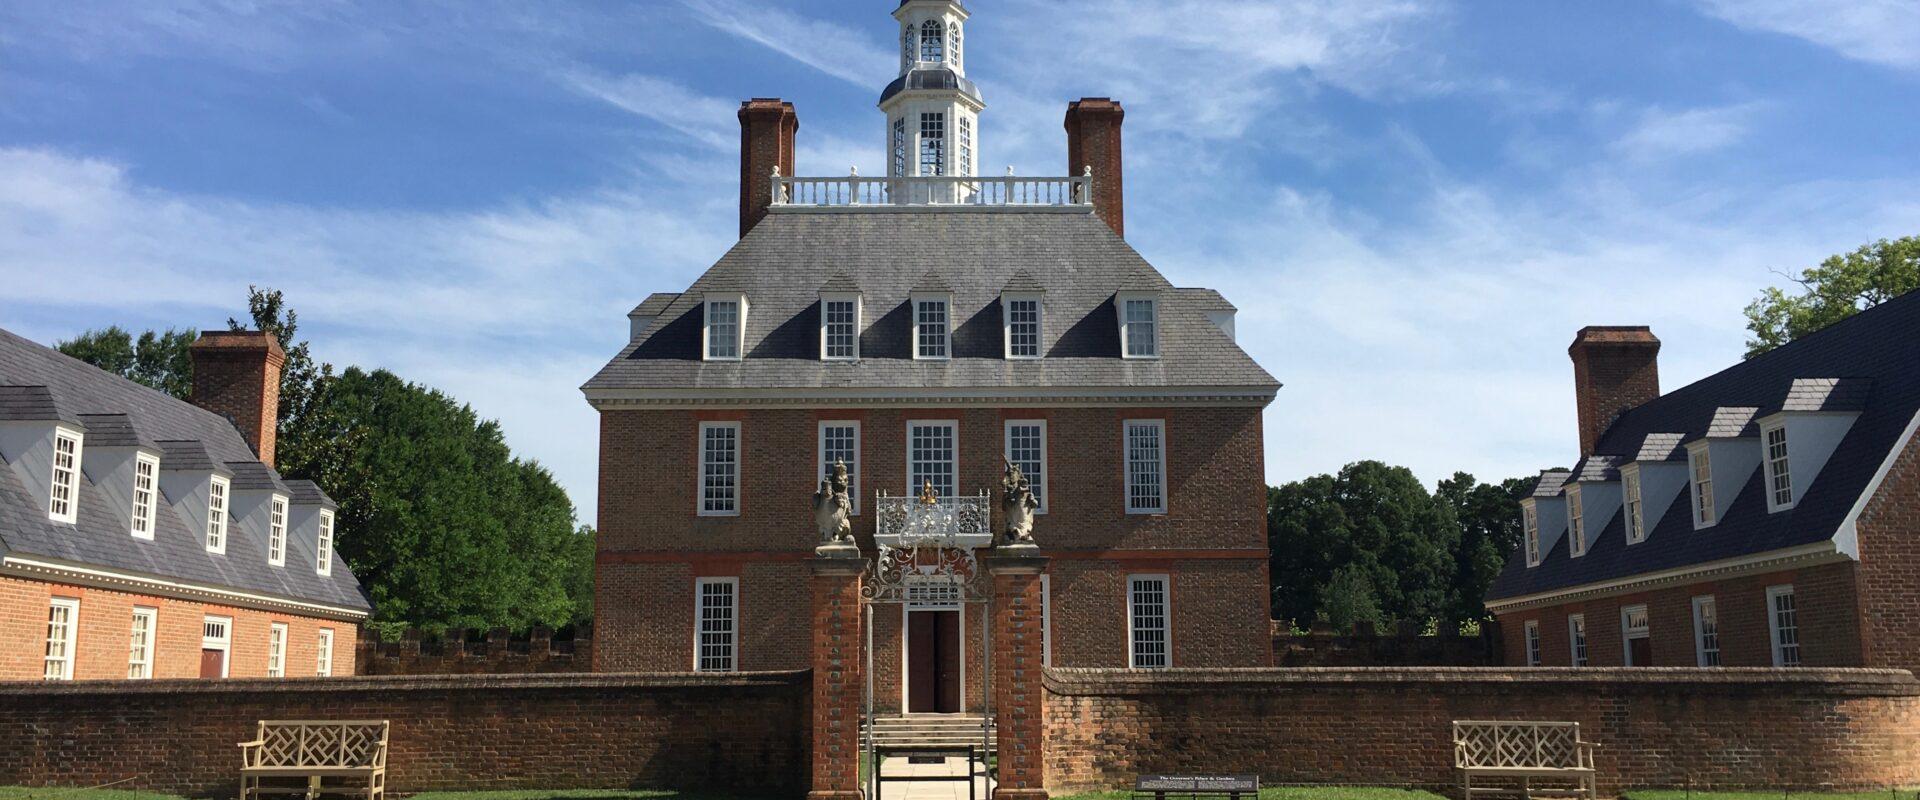 Governors Palace Colonial Williamsburg VA